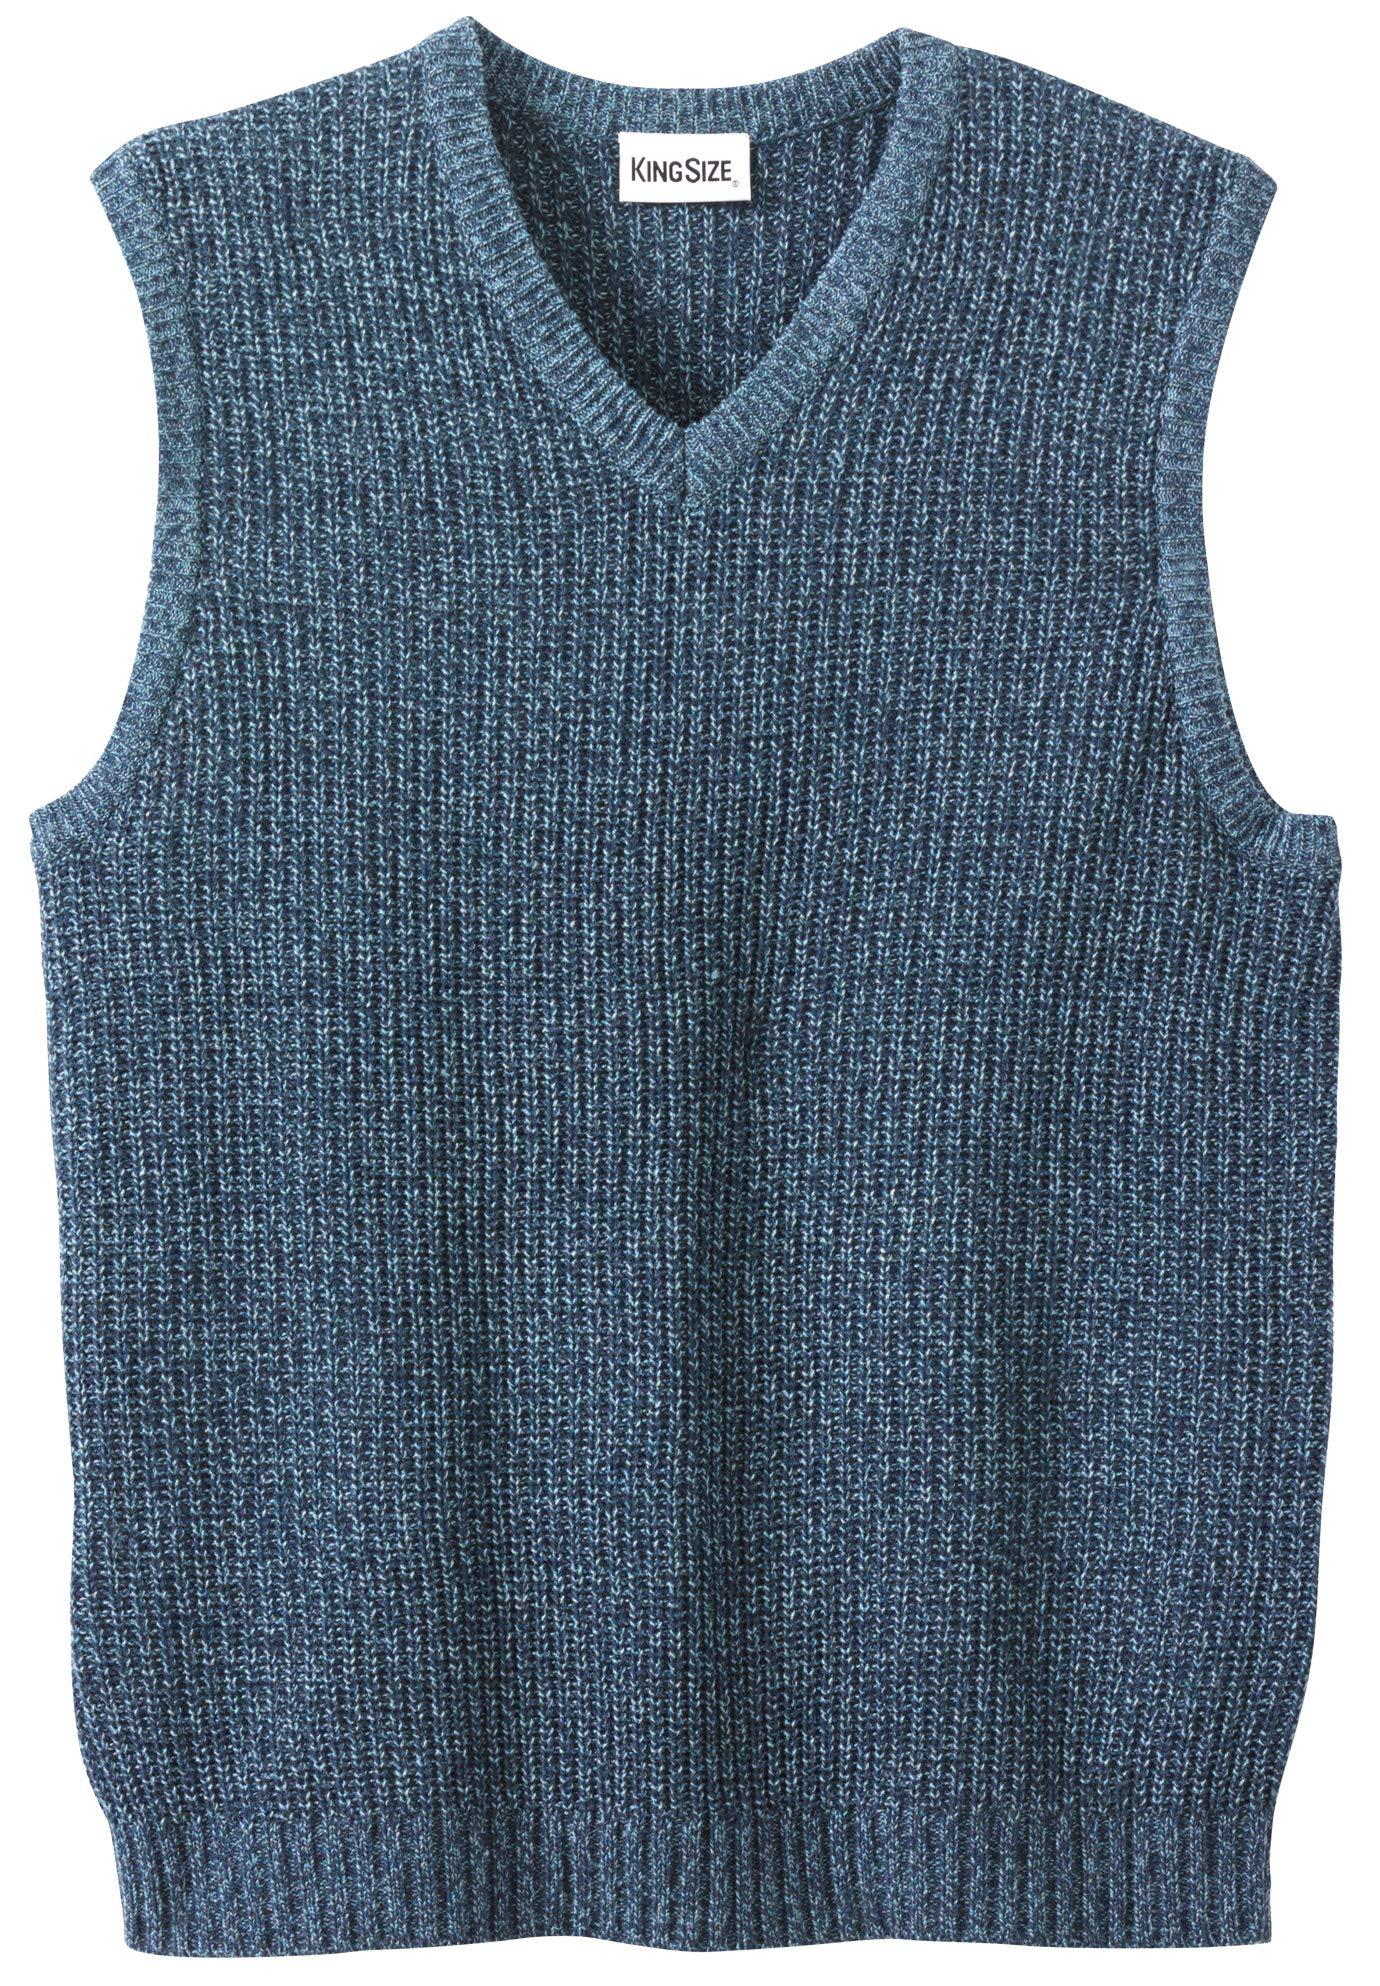 KingSize Men's Big & Tall Shaker Knit V-Neck Sweater Vest, Navy Marl Tall-4XL by KingSize